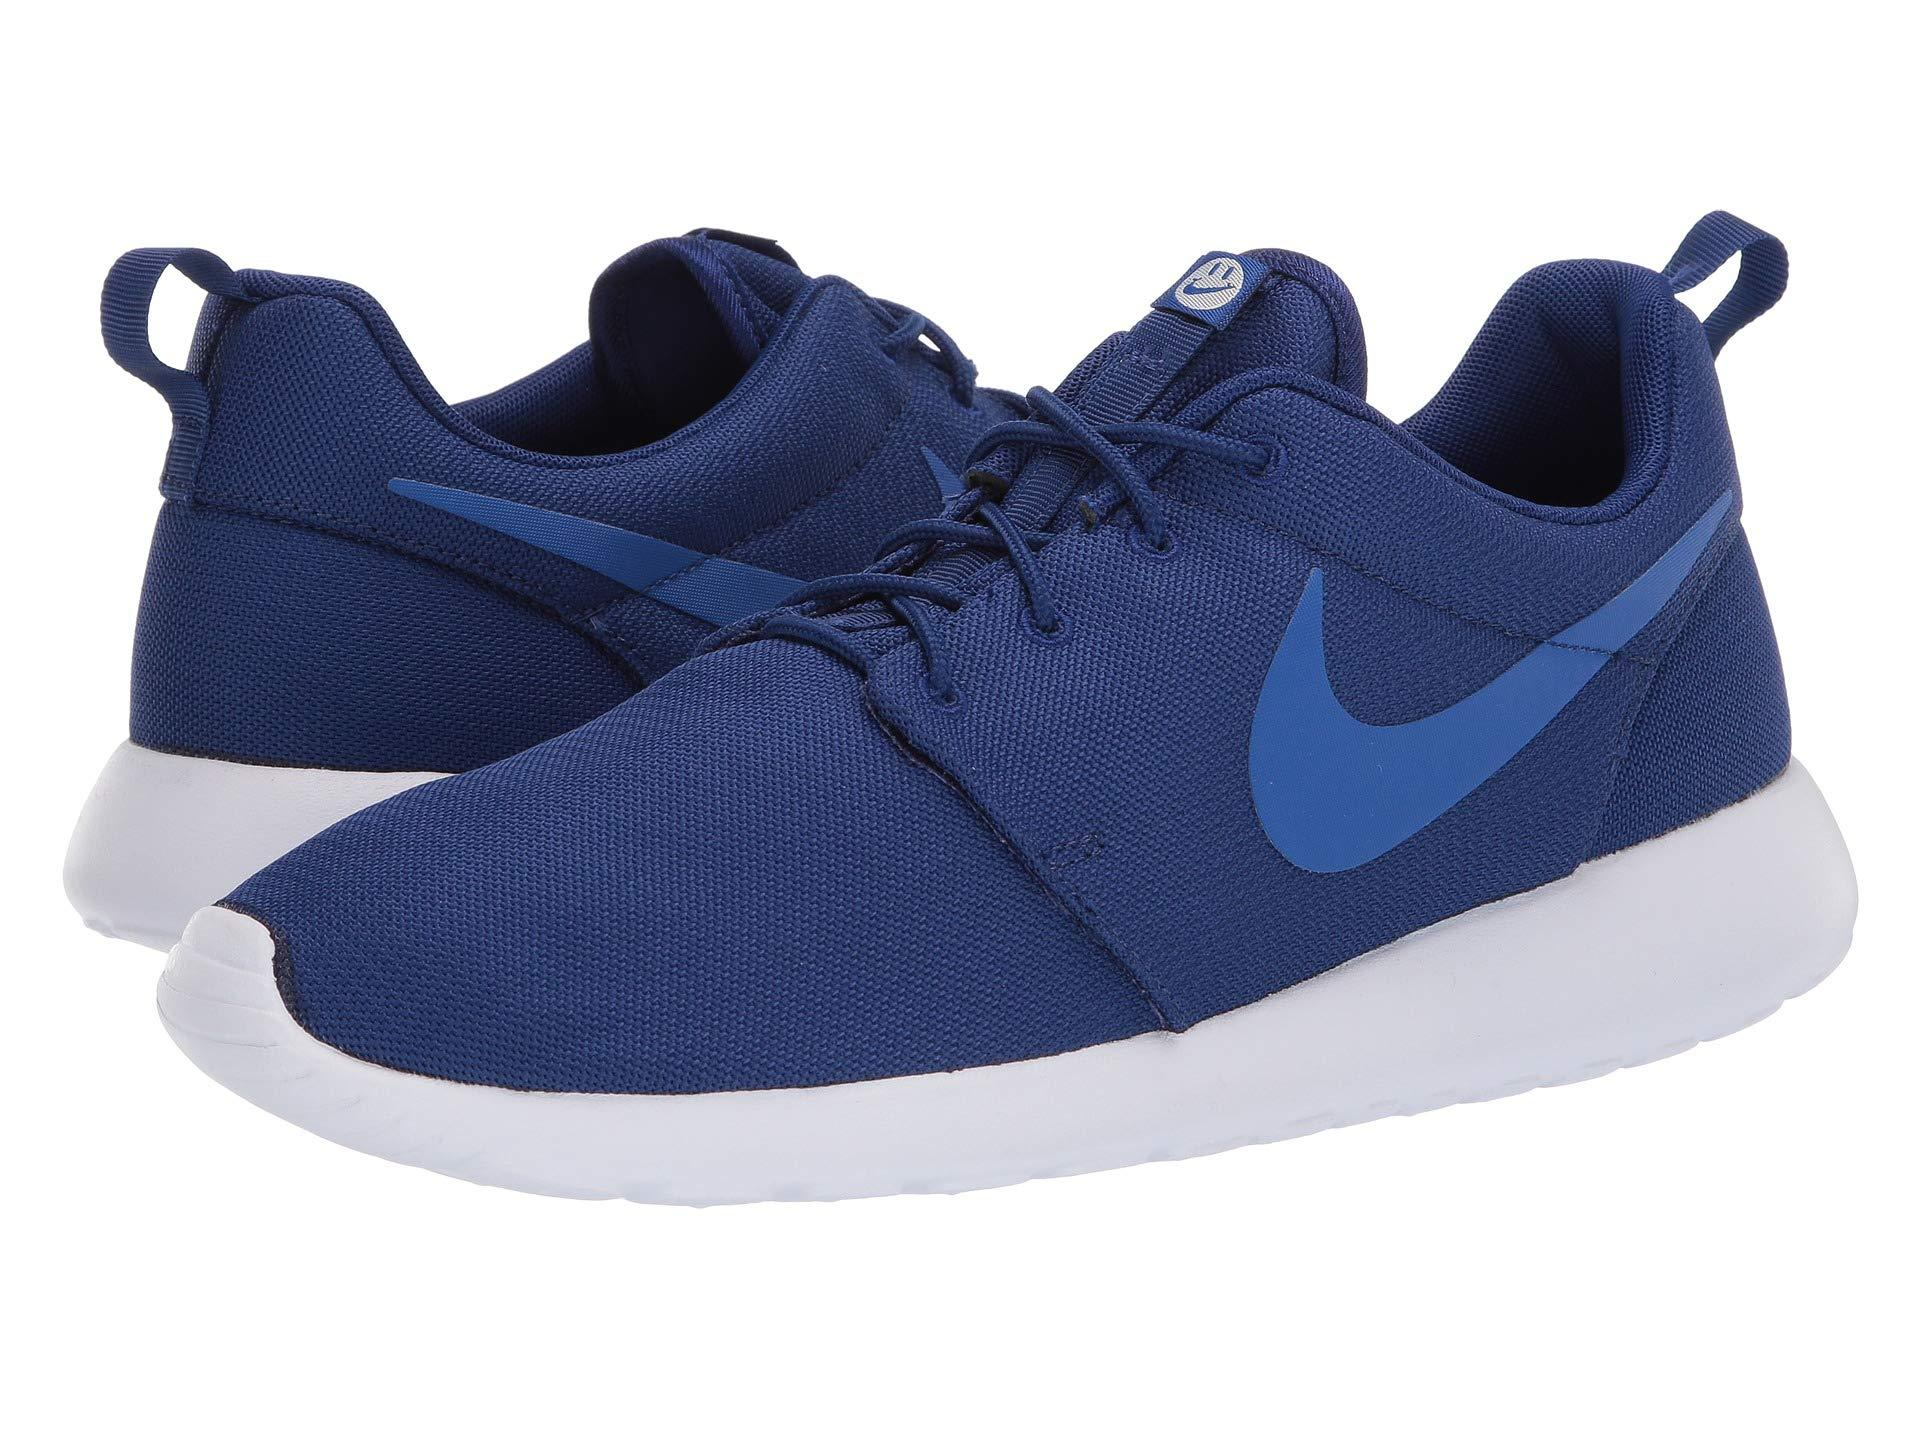 promo code fb116 6a543 Nike. Blue Roshe One (black black) Men s Classic Shoes